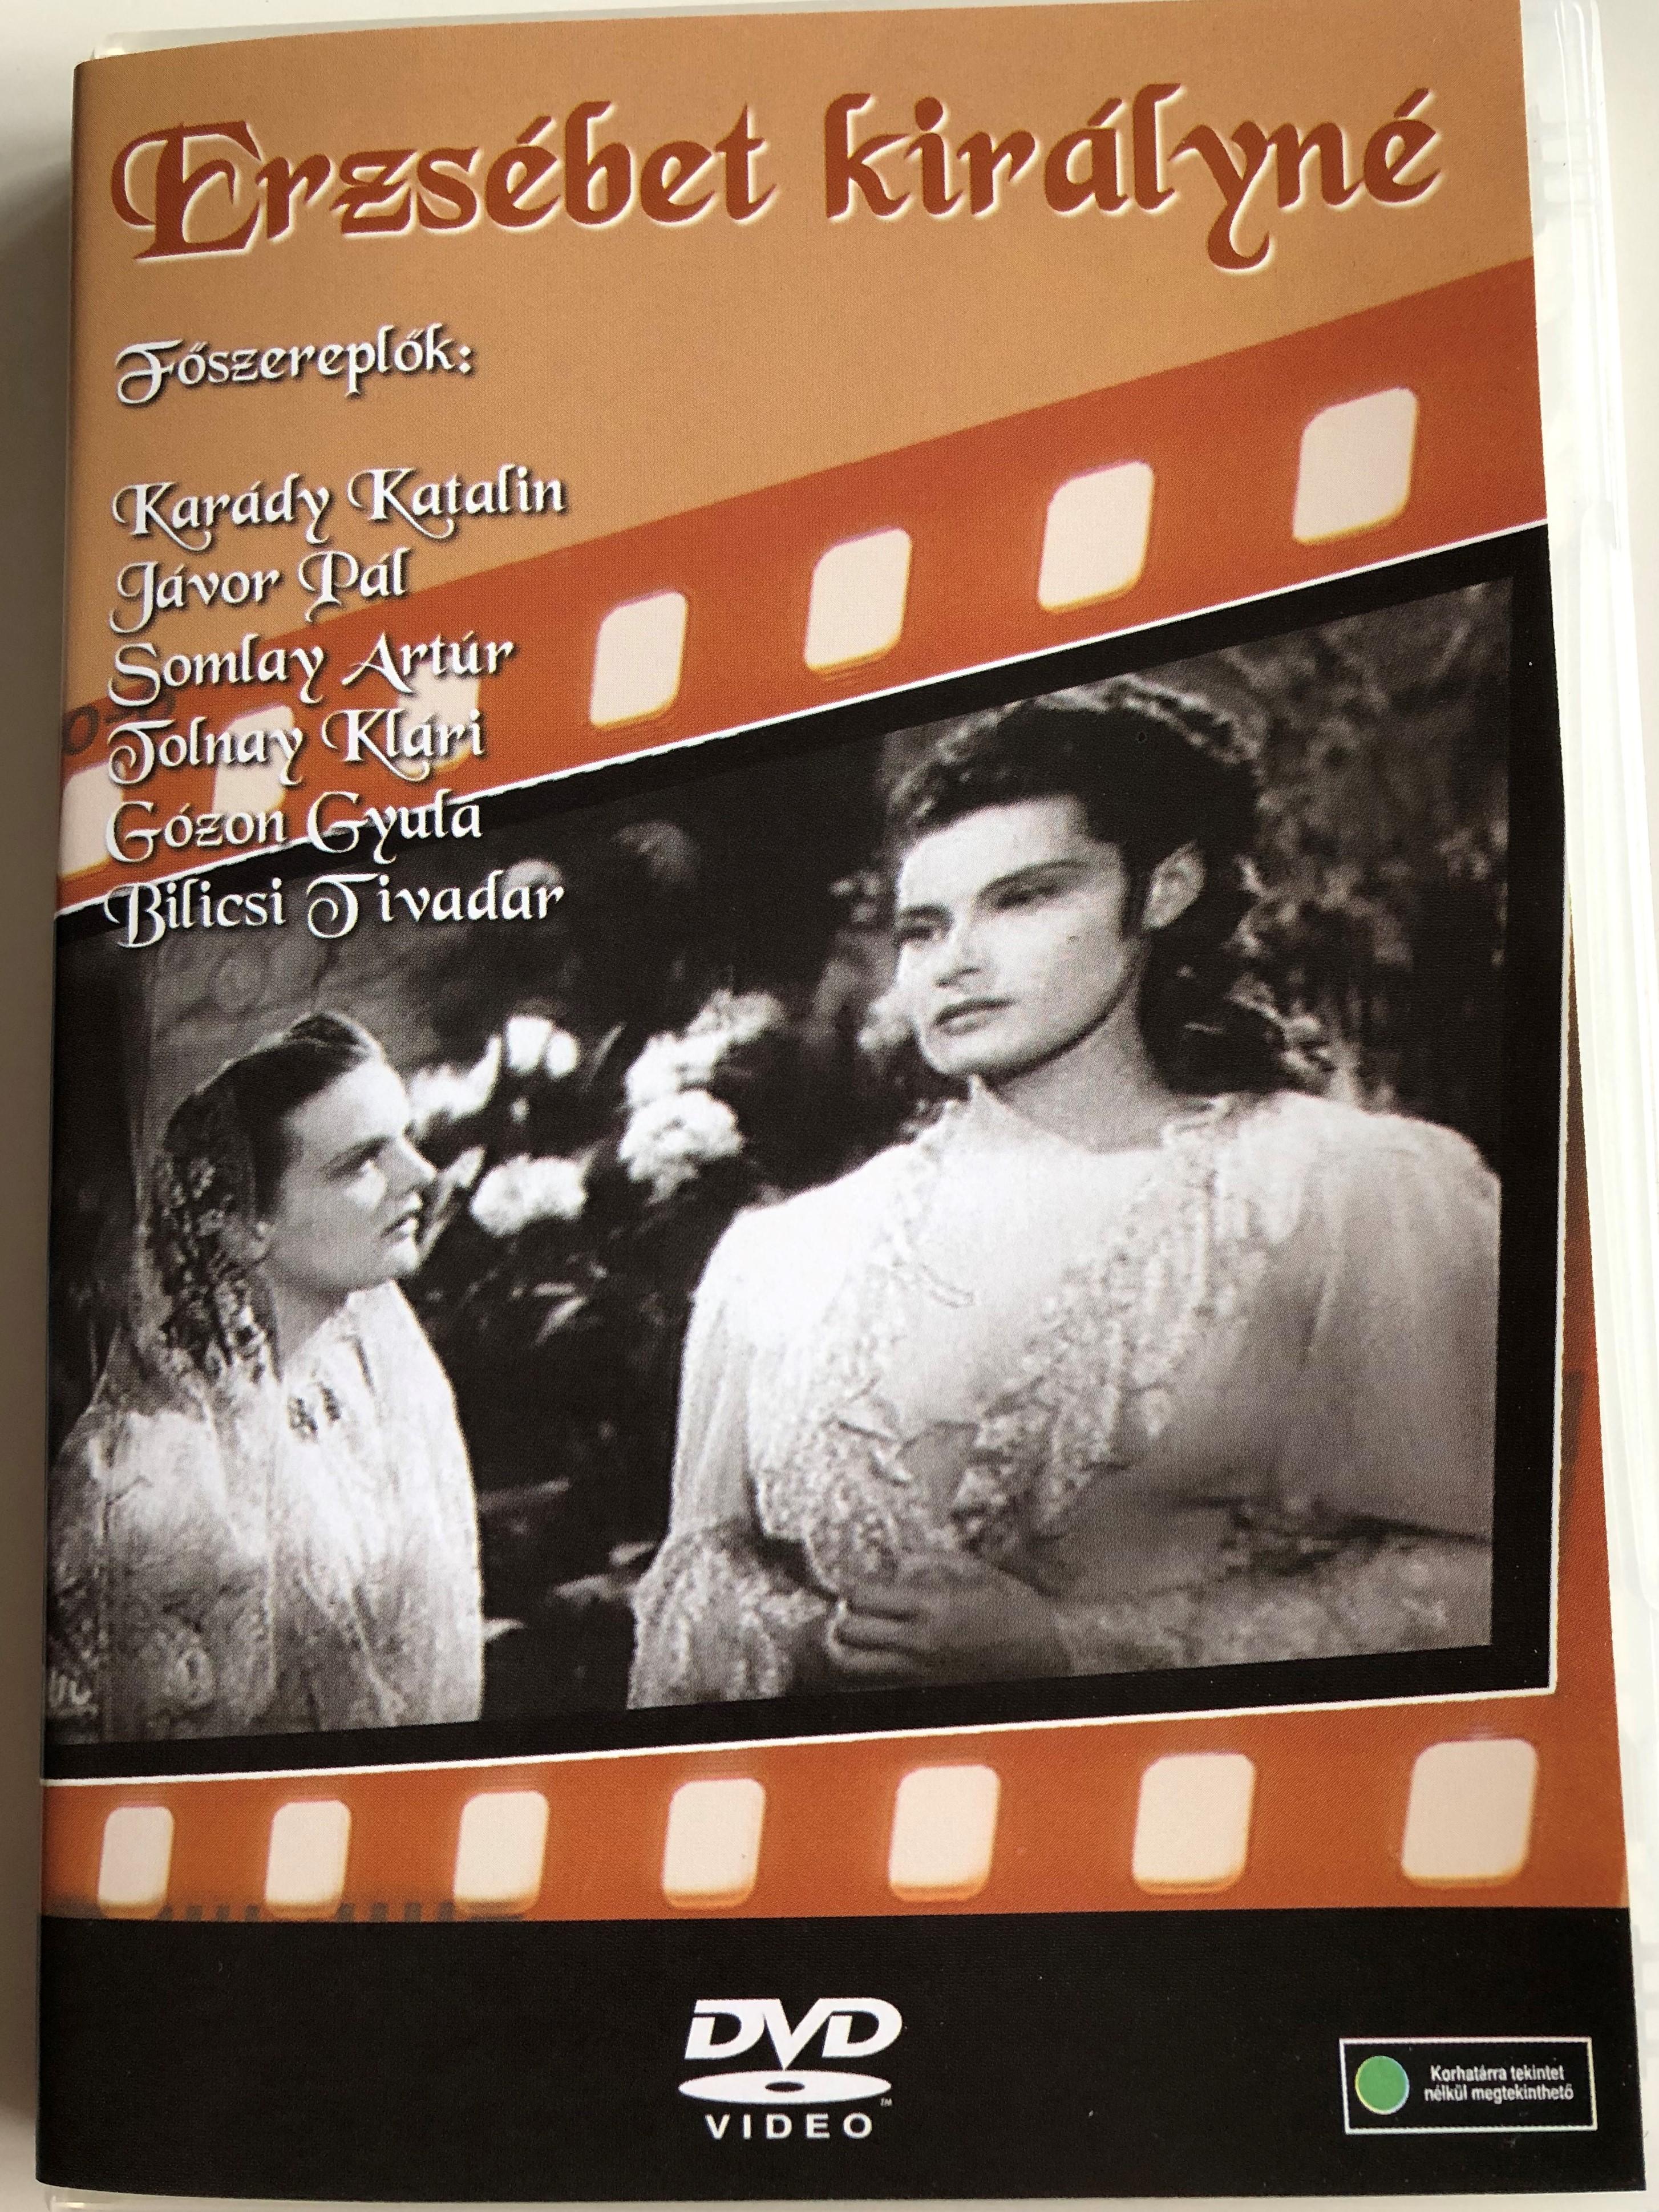 erzs-bet-kir-lyn-dvd-1940-r-gi-magyar-filmek-1.jpg